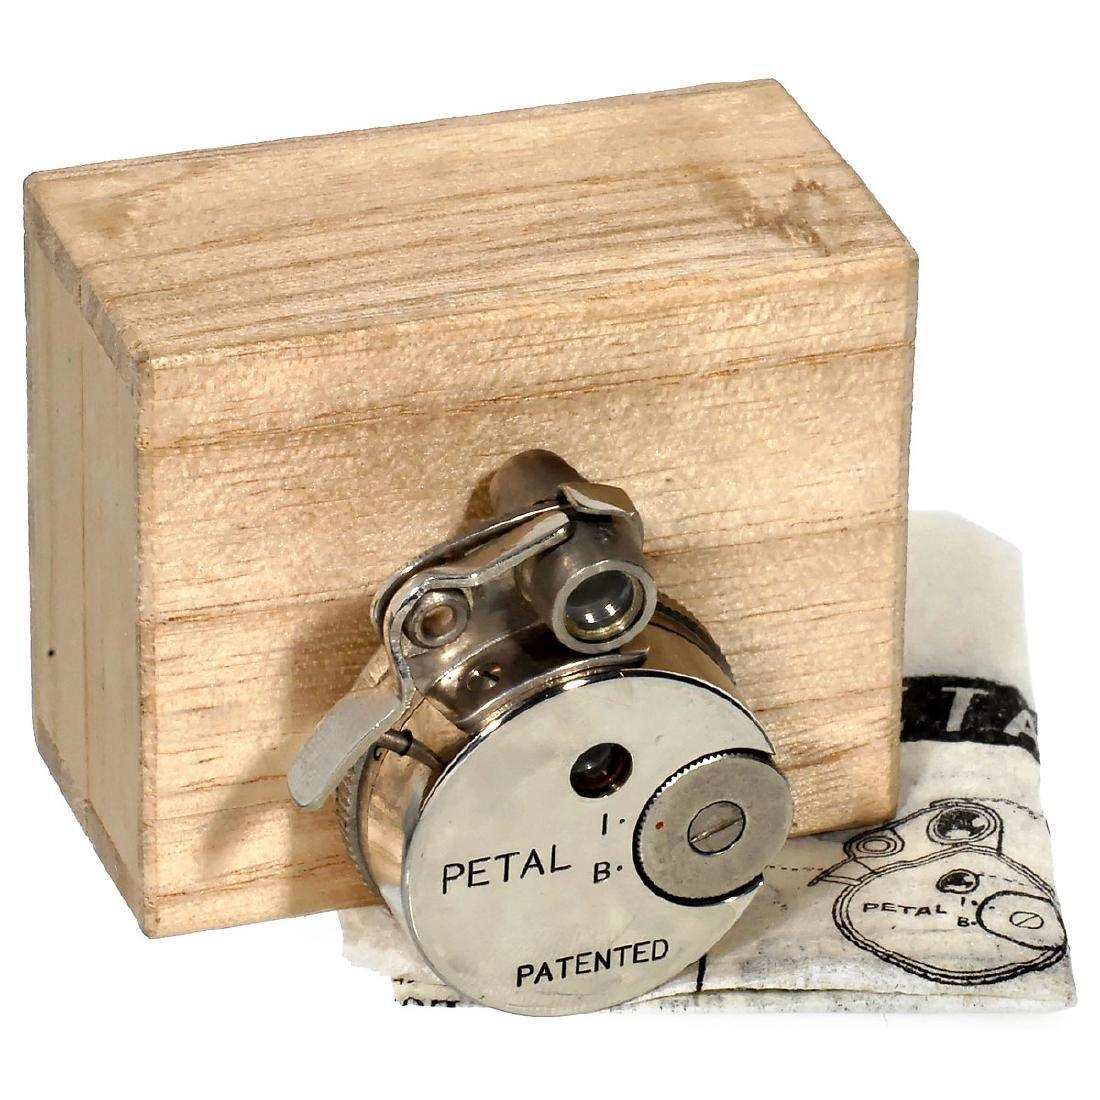 Subminiature Camera Petal, 1948 - 2